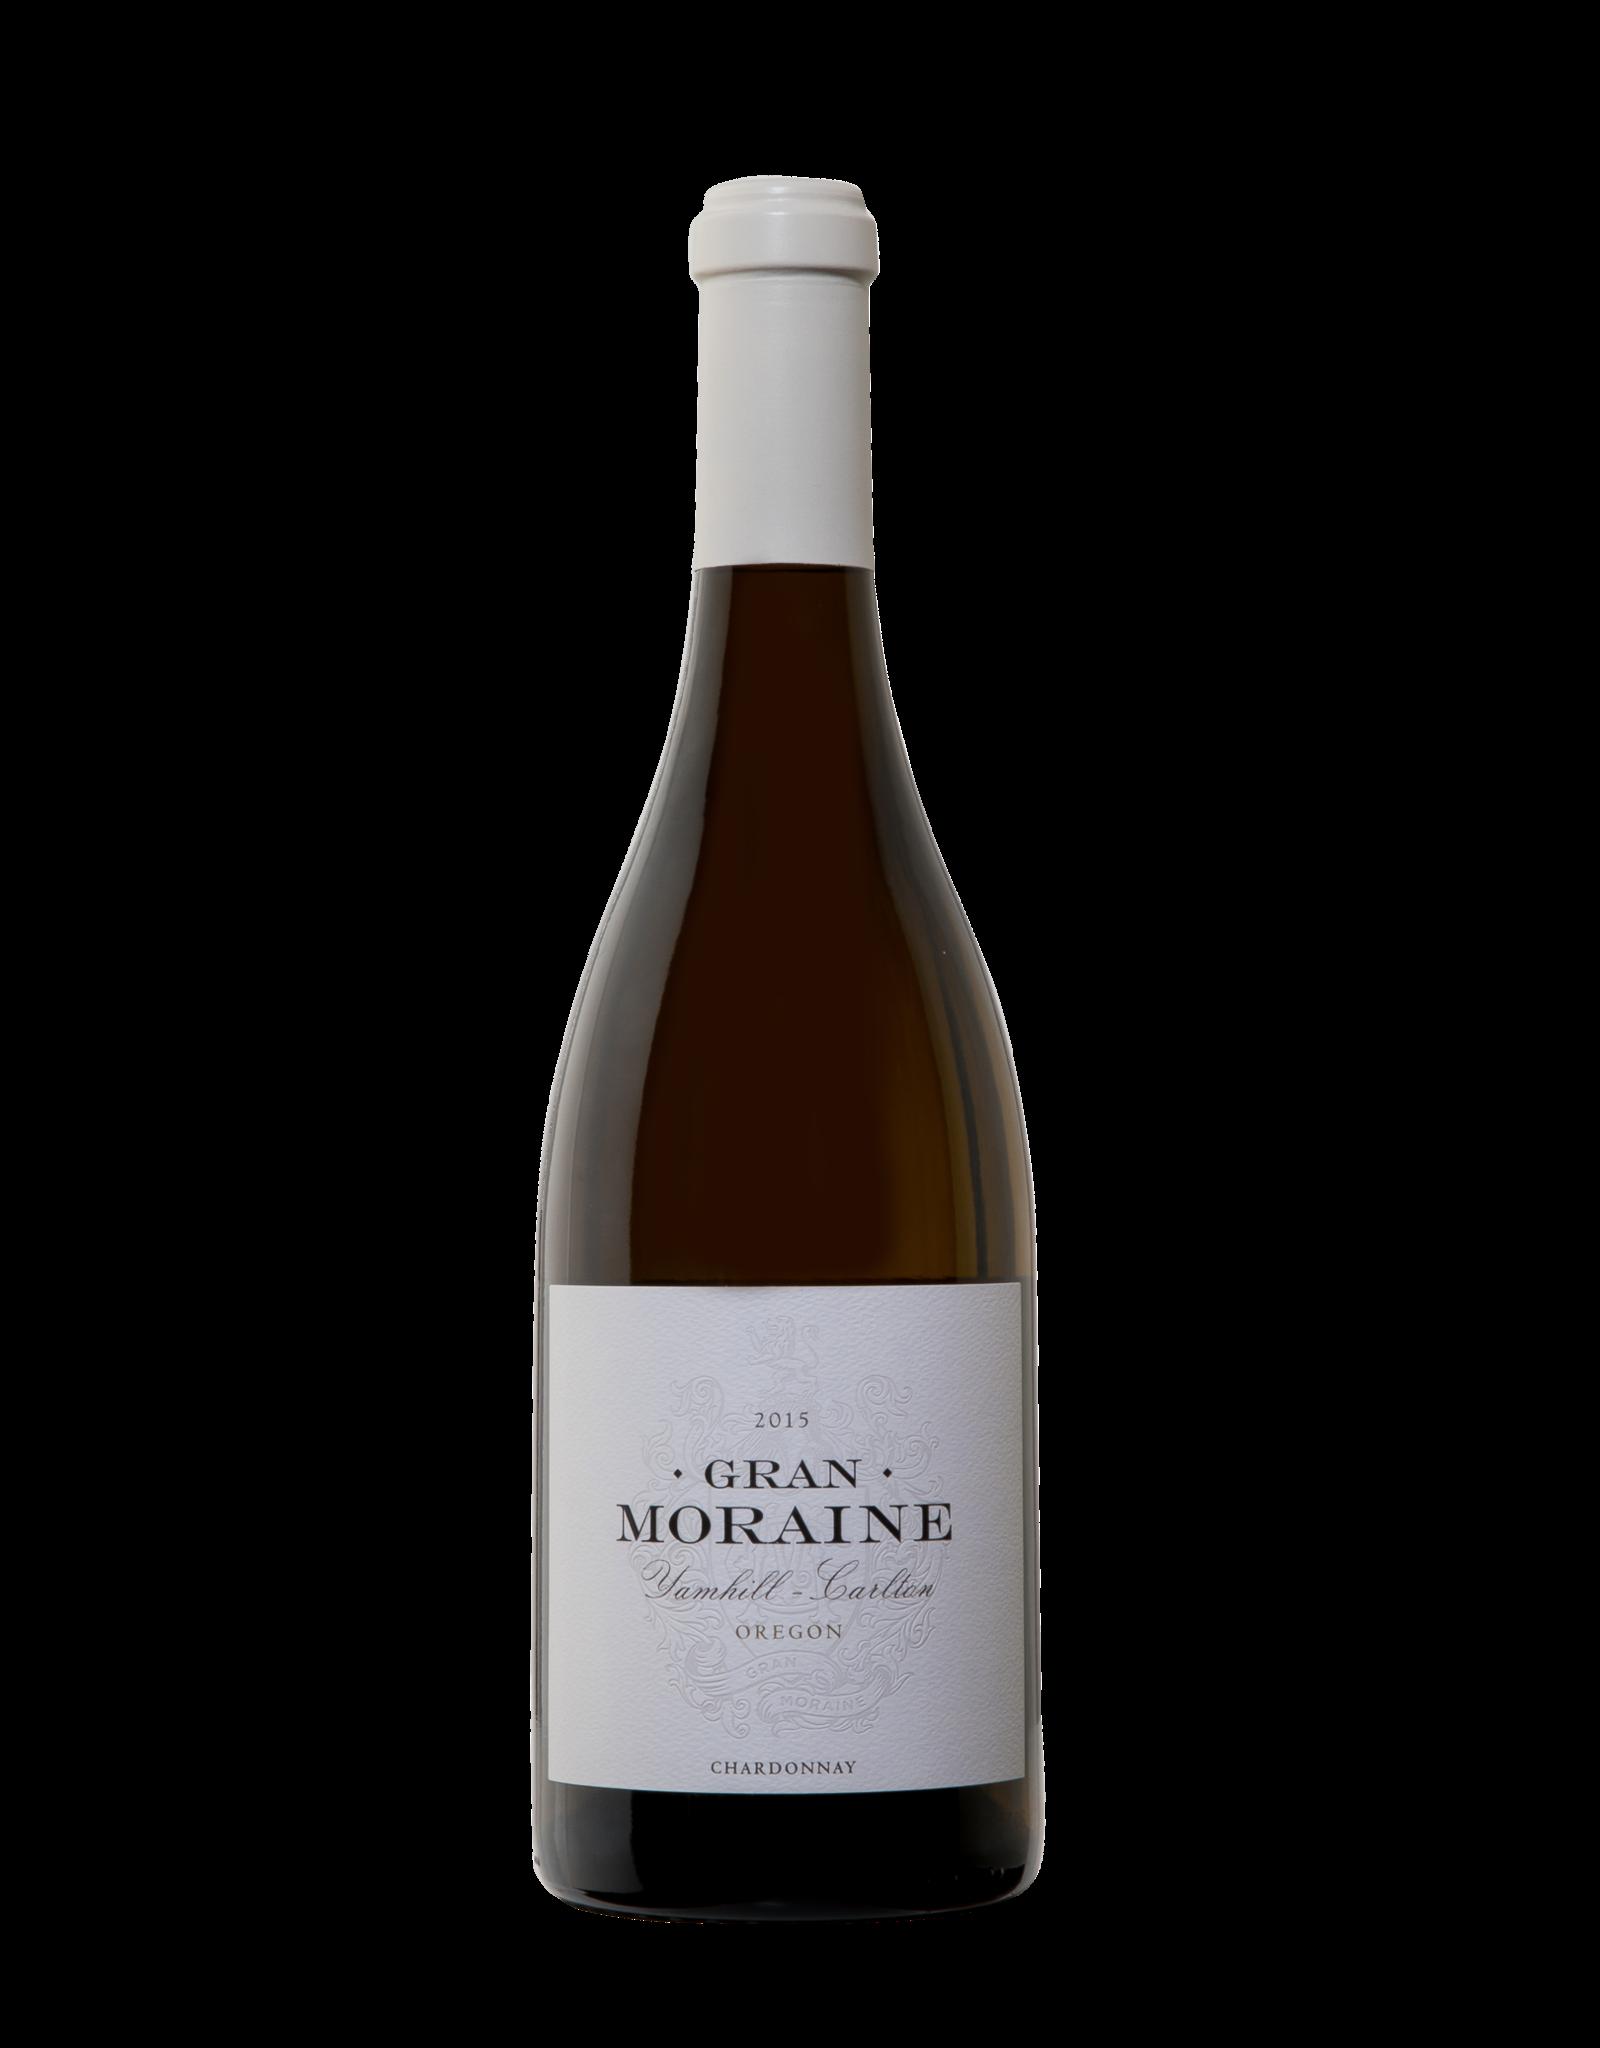 Gran Moraine Yamhill Carlton Chardonnay 2015